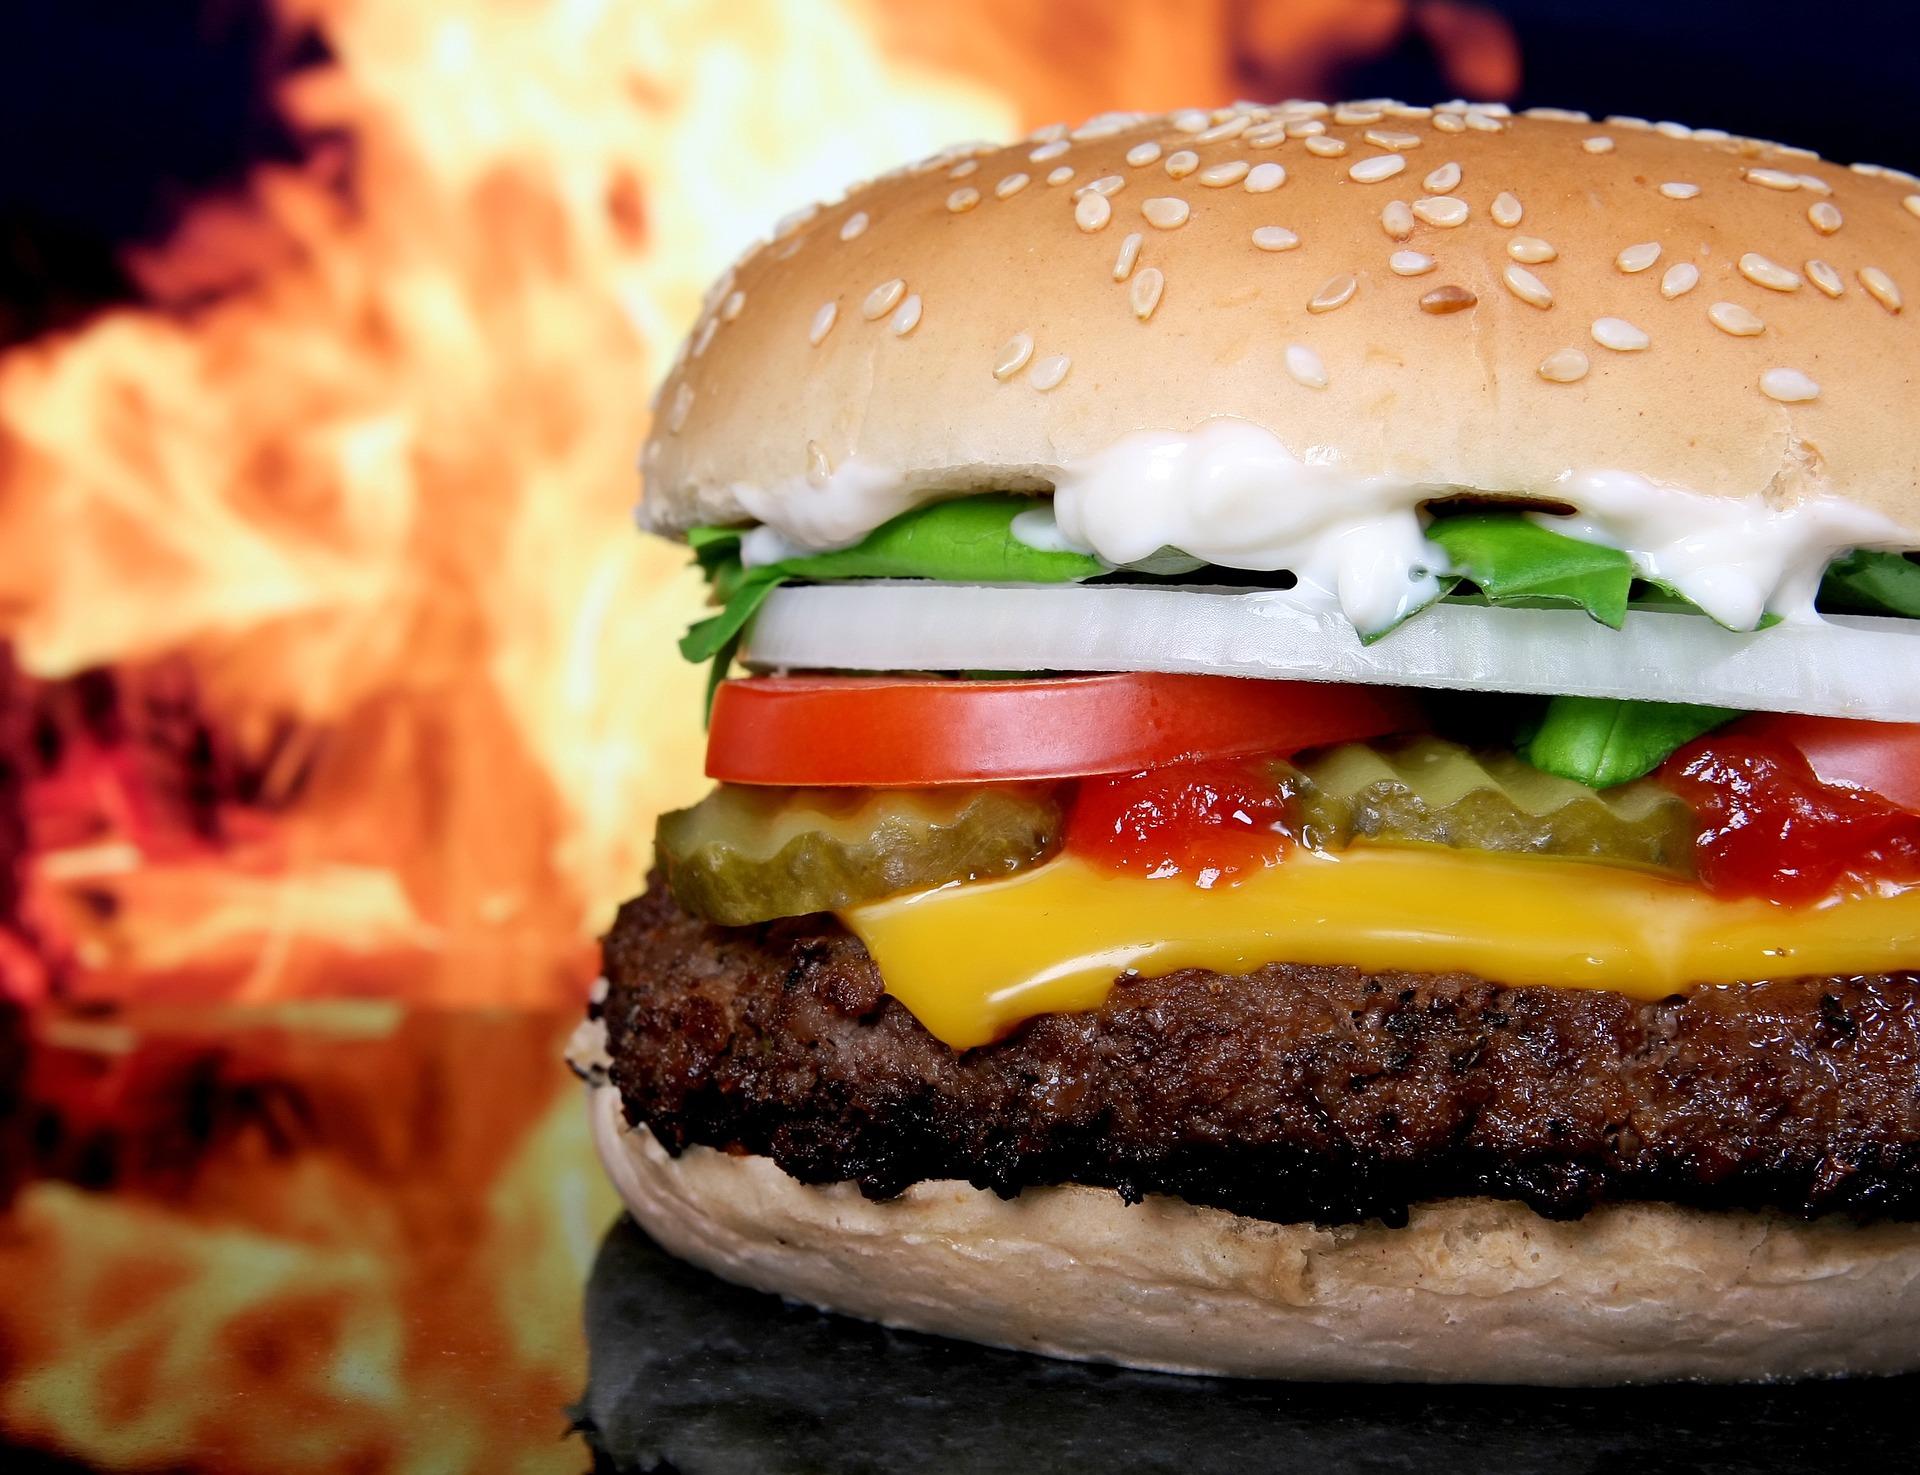 Dyspepsia burger